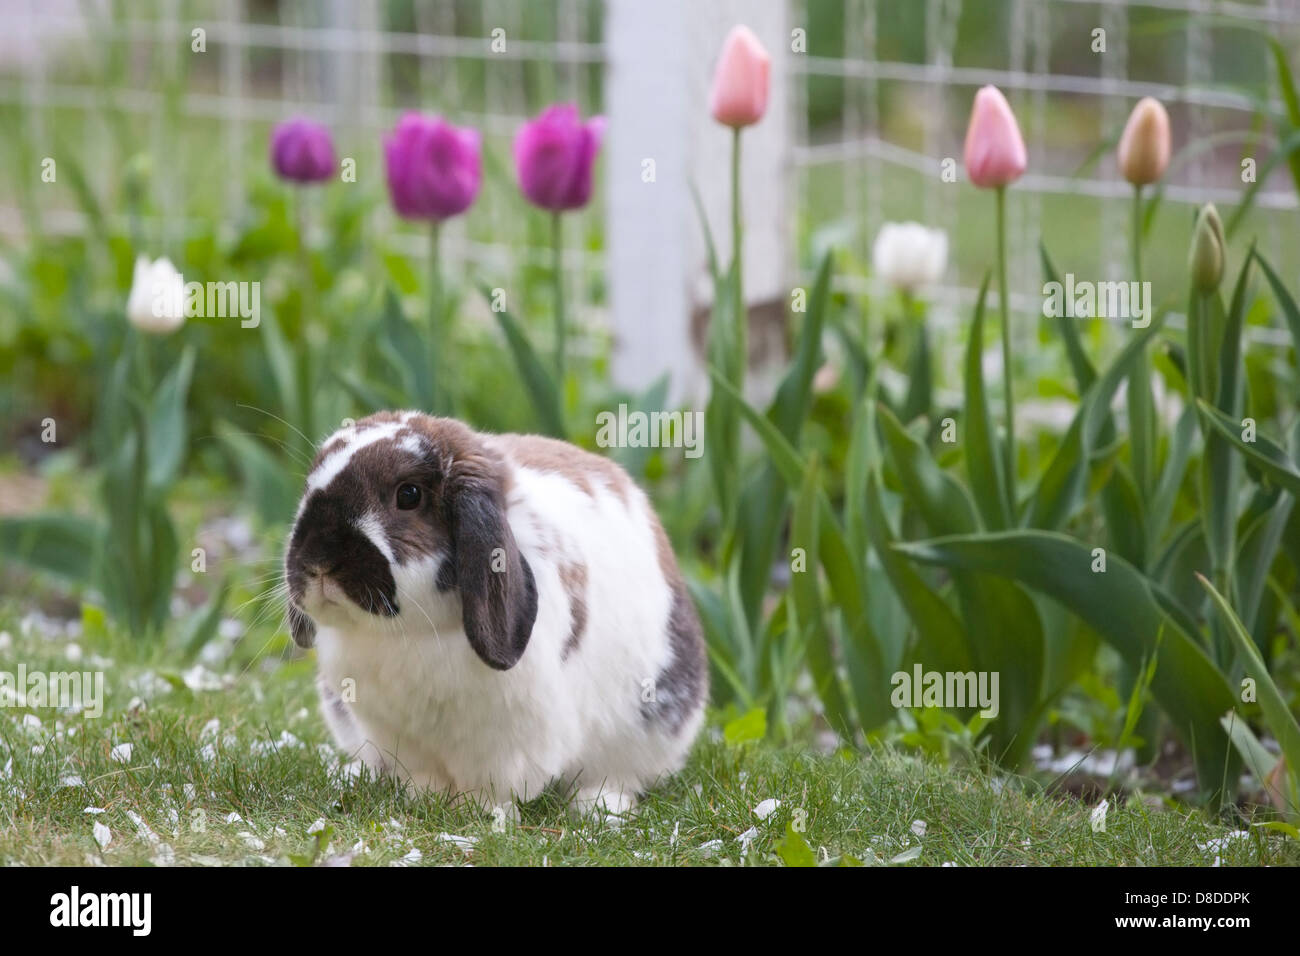 holland lop kaninchen drau en im garten stockfoto bild. Black Bedroom Furniture Sets. Home Design Ideas